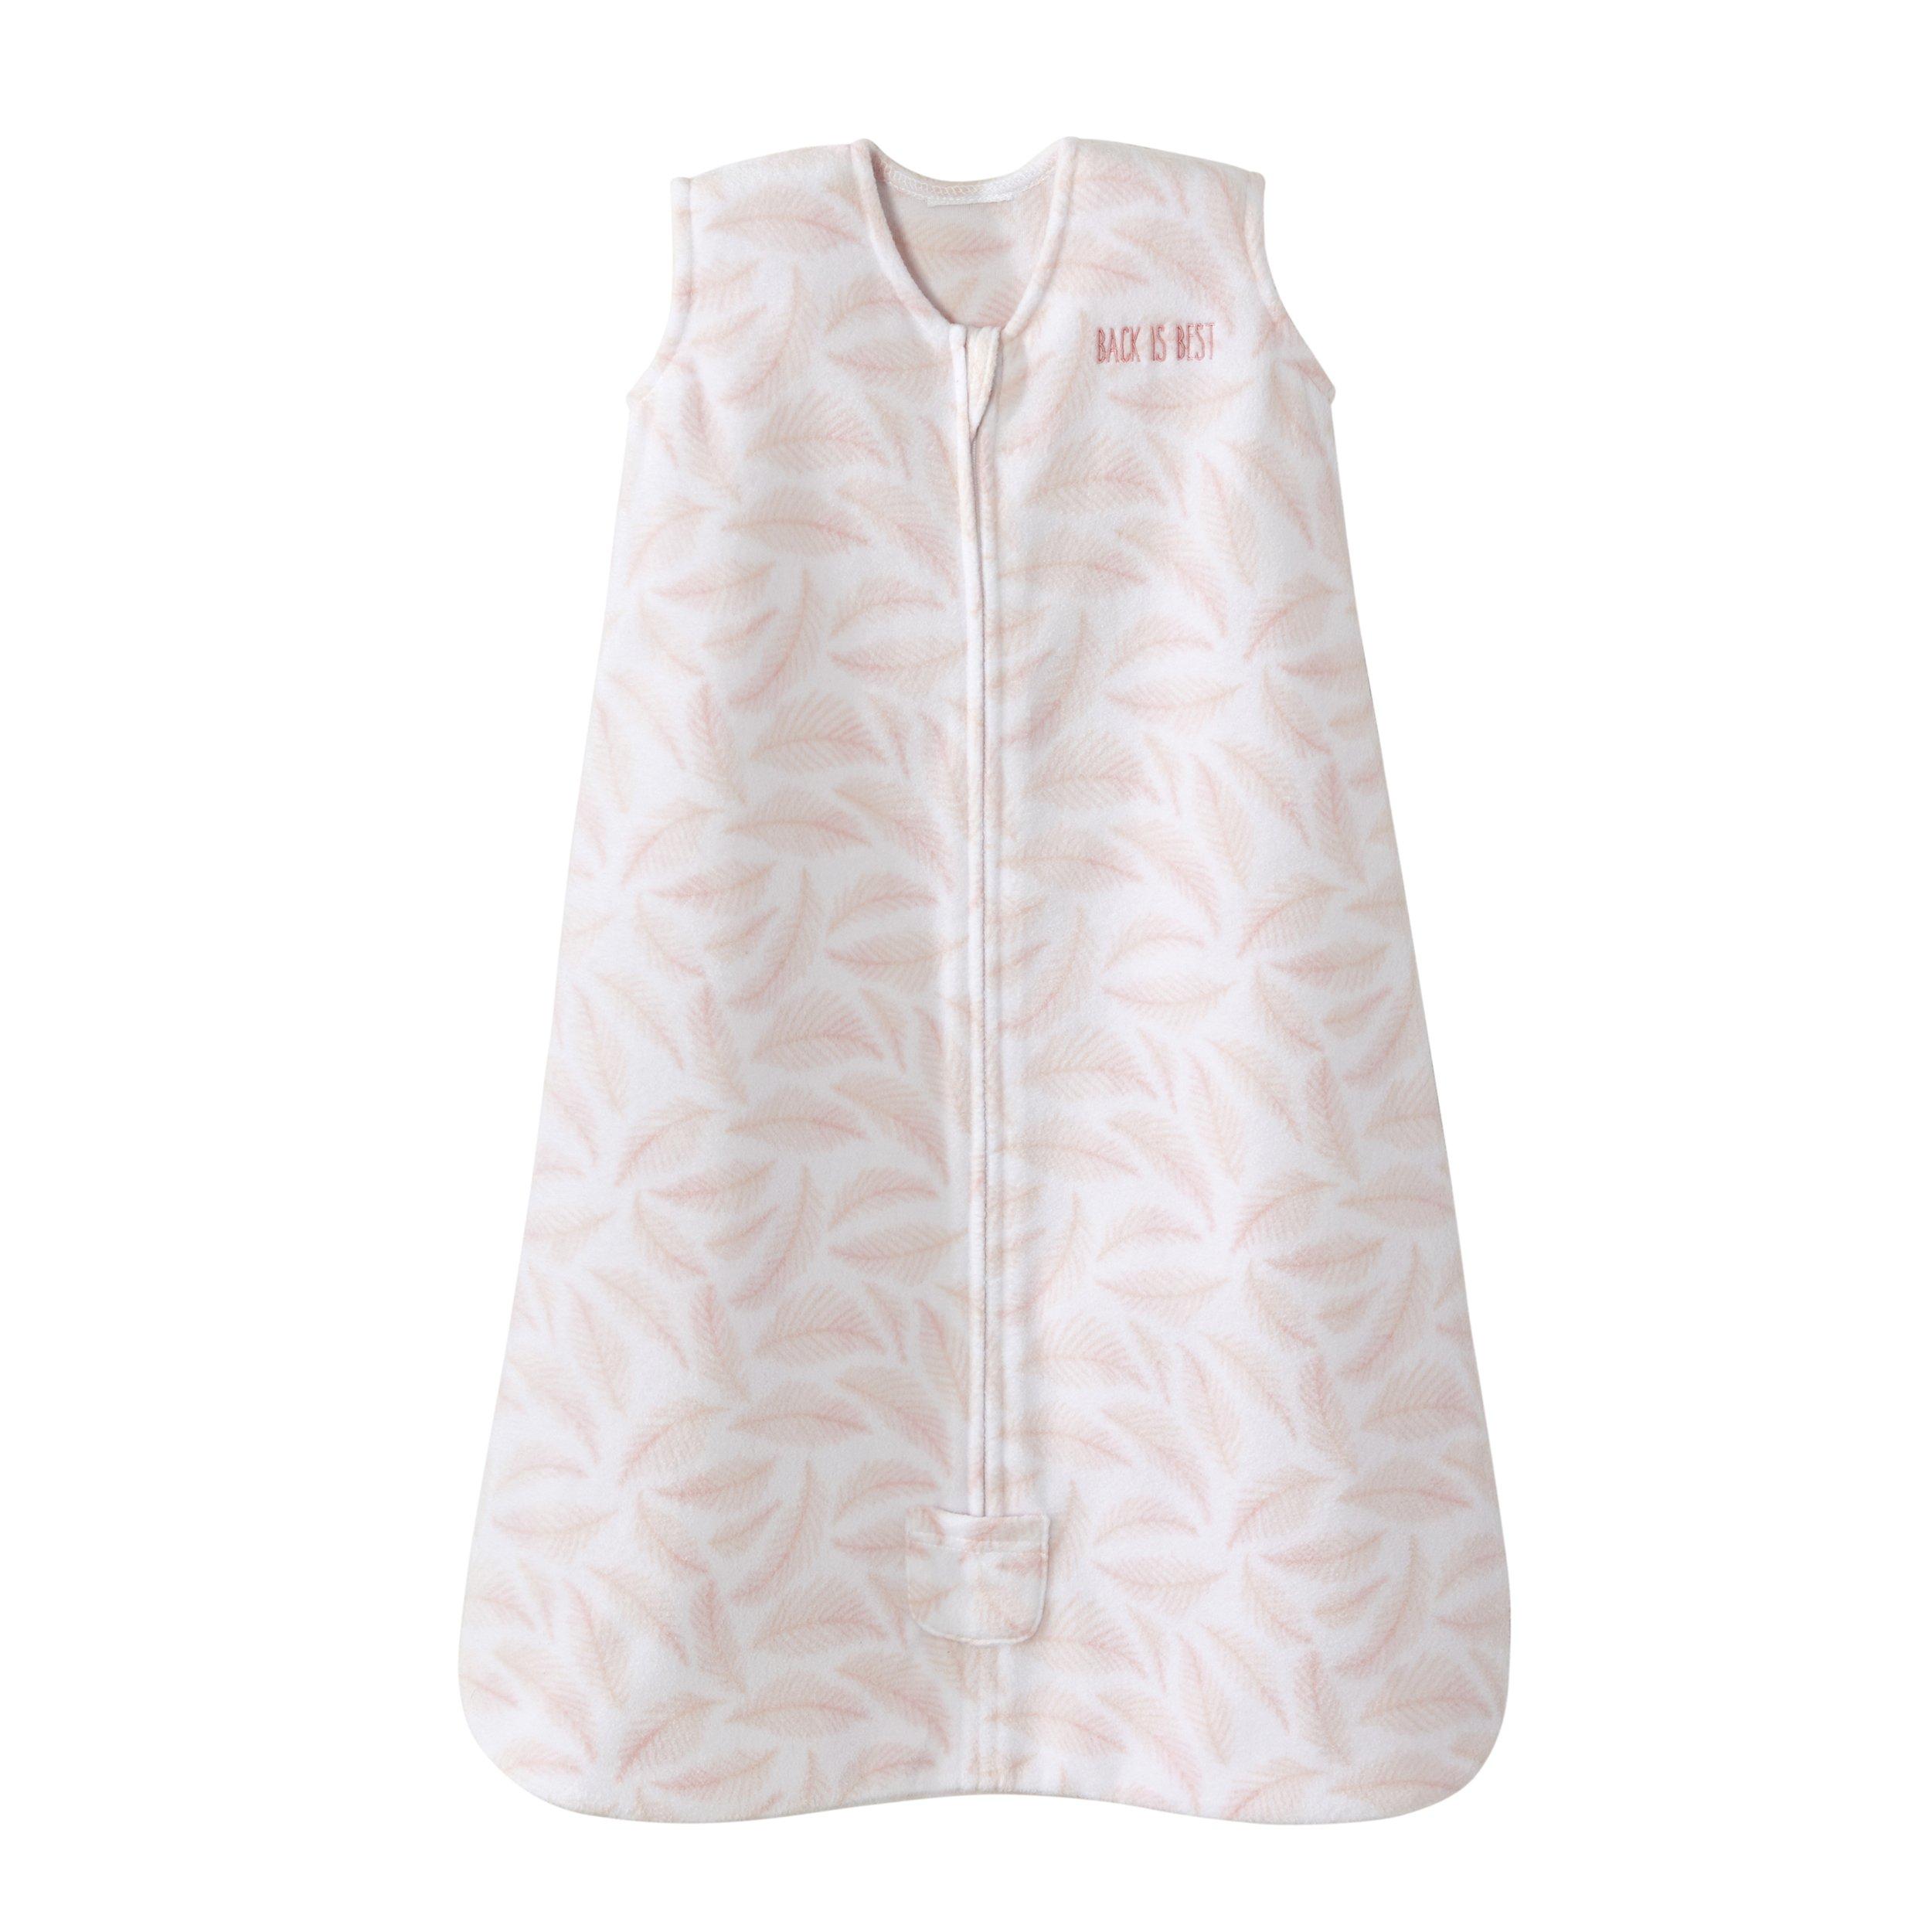 Halo Sleepsack Wearable Blanket Micro Fleece - Pine Leaves Pink,Medium